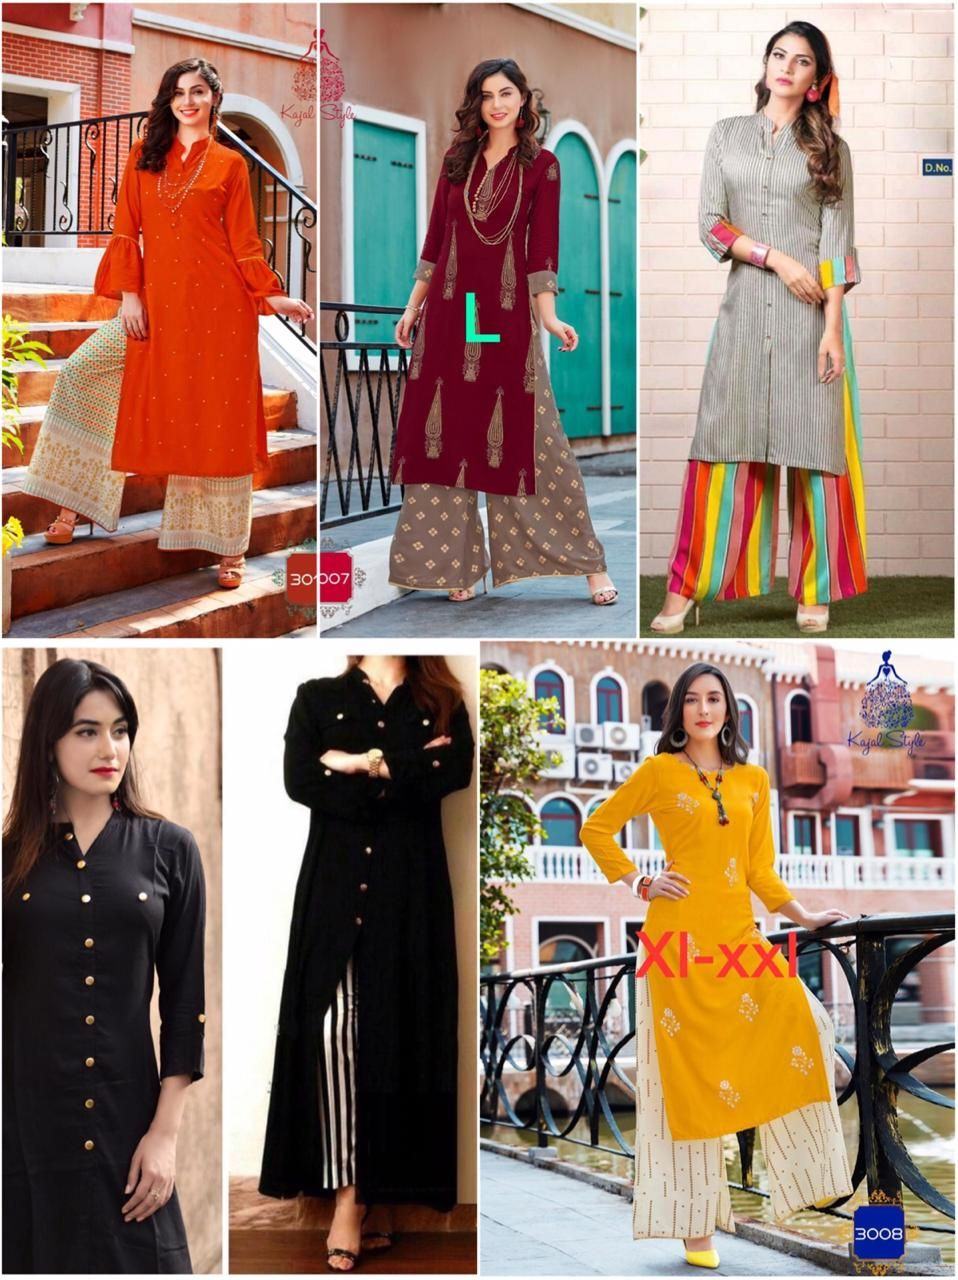 Pin by Kulpreet kaur on Fashion ideas Fashion, Kurti